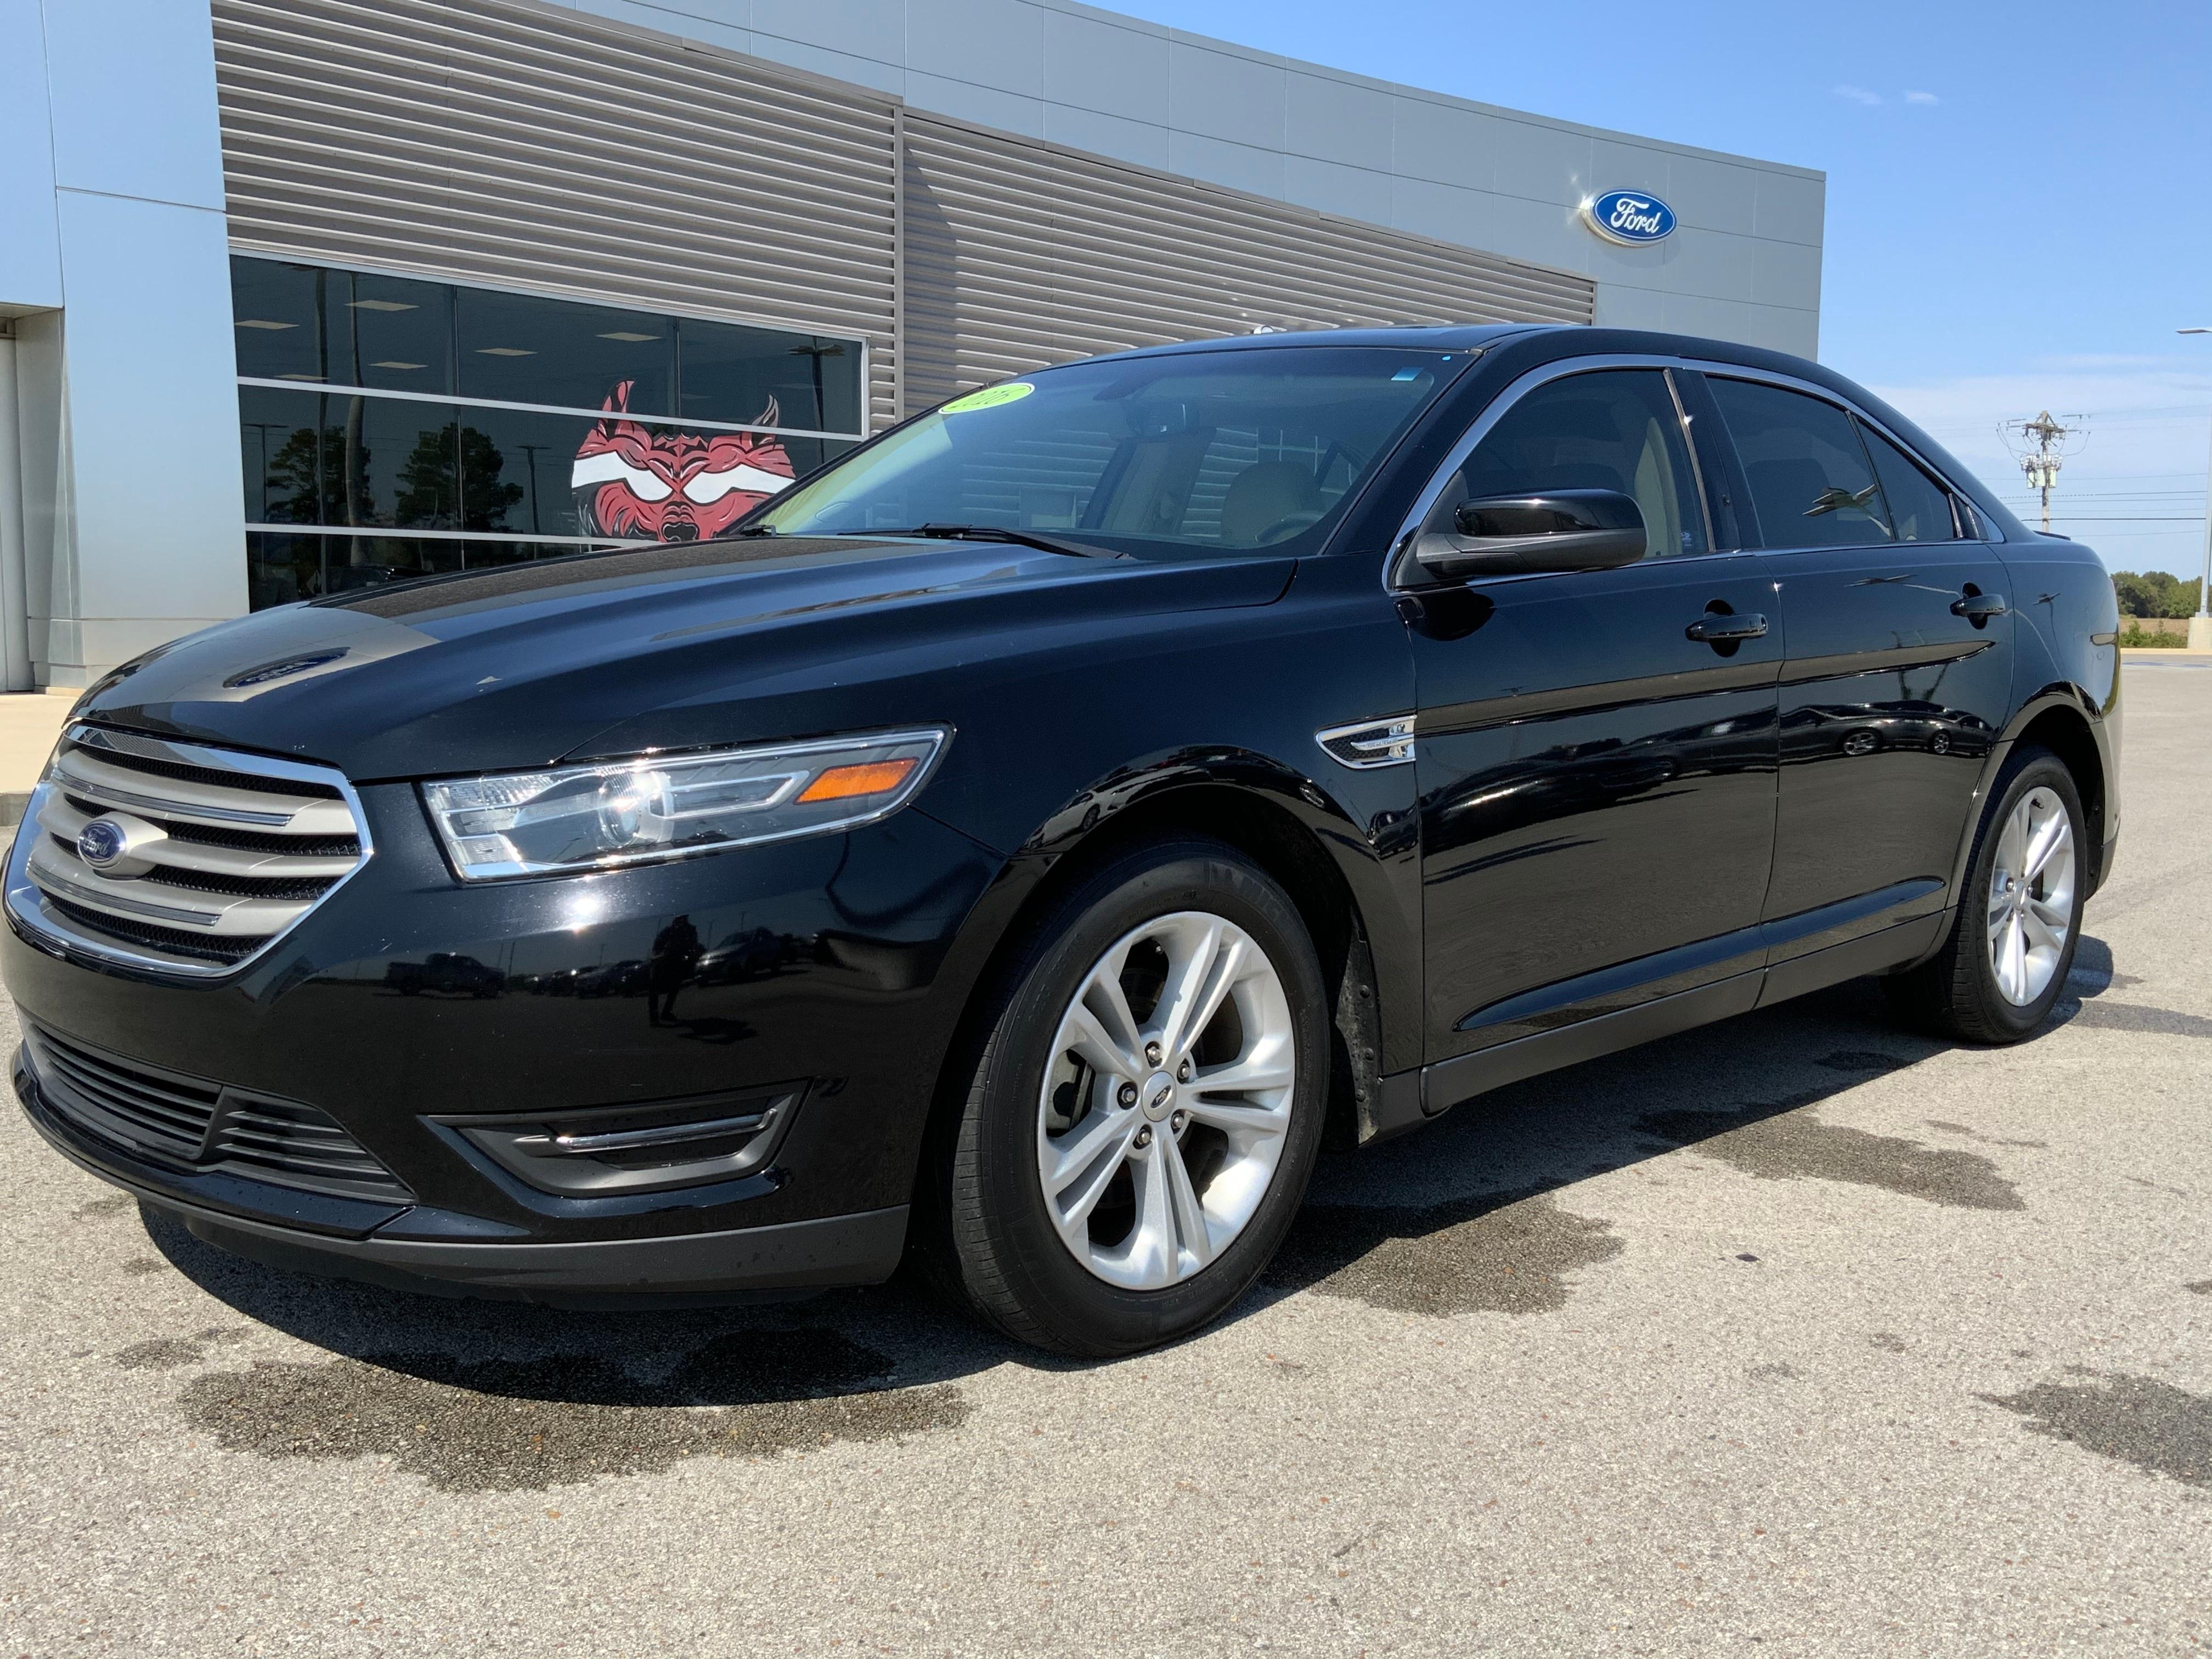 Used 2016 Ford Taurus SEL Sedan for Sale in Trumann, AR